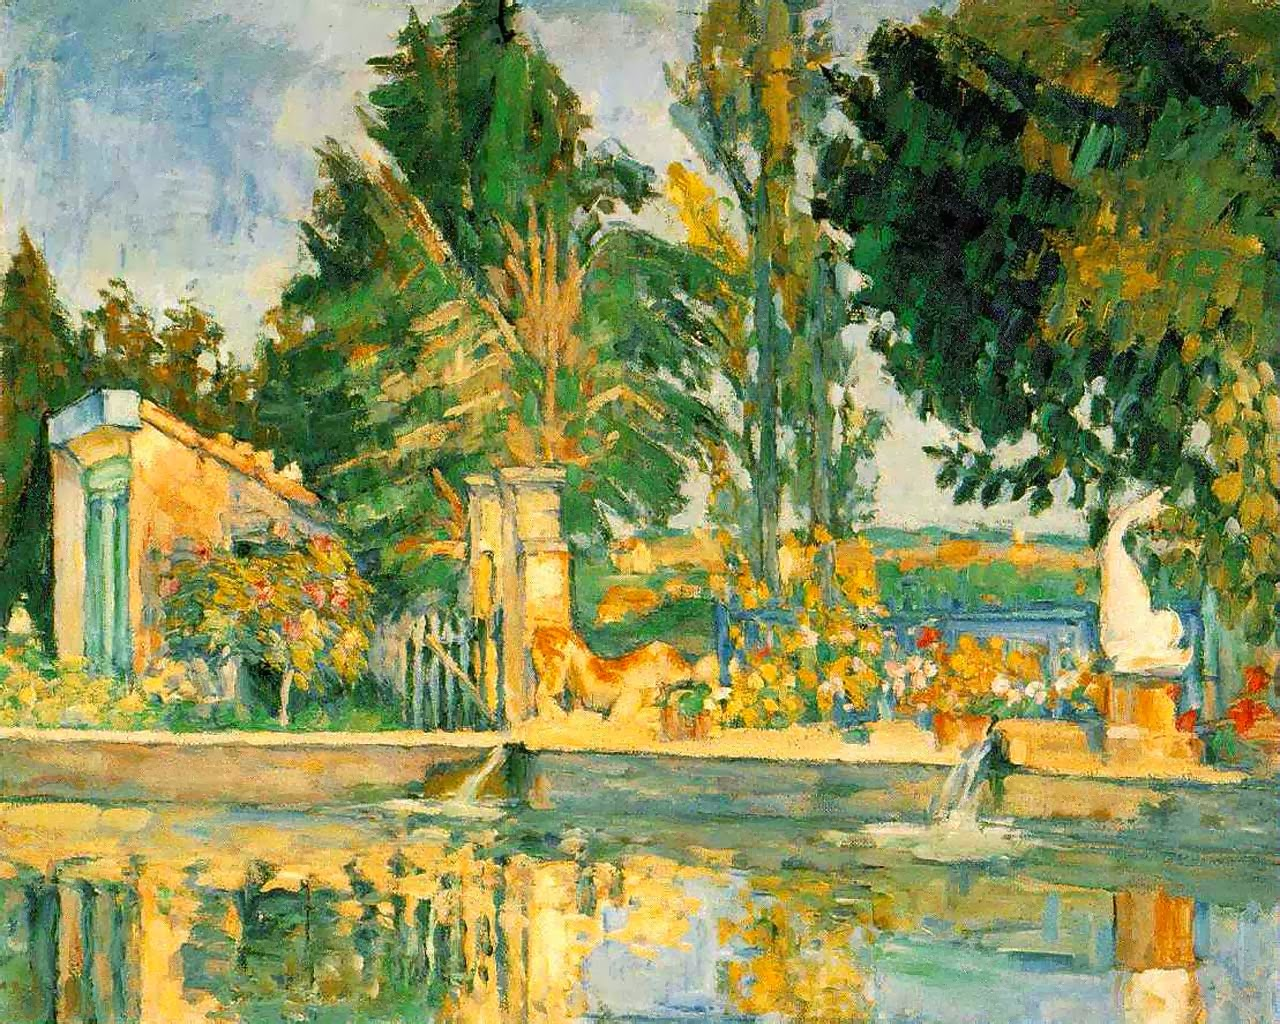 Paul Cézanne en el Museo Thyssen Bornemisza